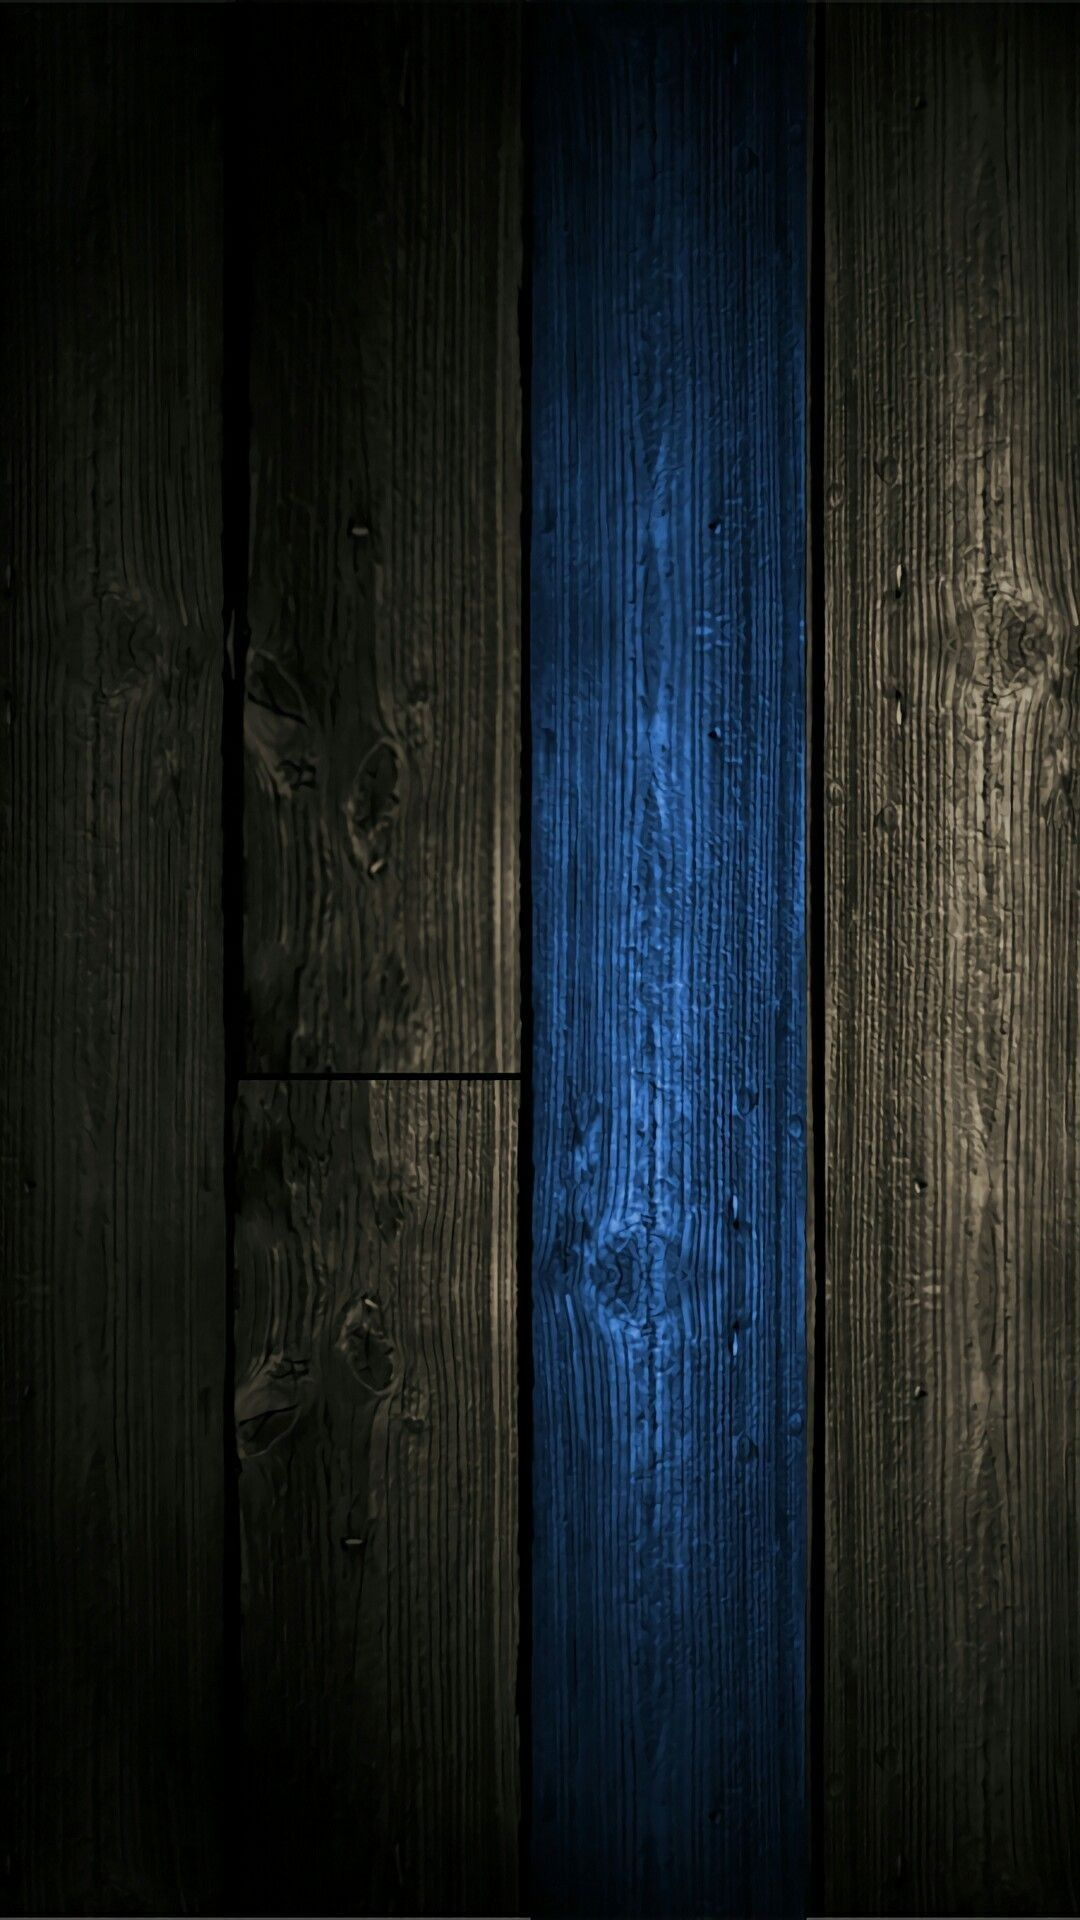 Wood Black Background Image In 2020 Wood Wallpaper Blue Wallpaper Iphone Thin Blue Line Wallpaper